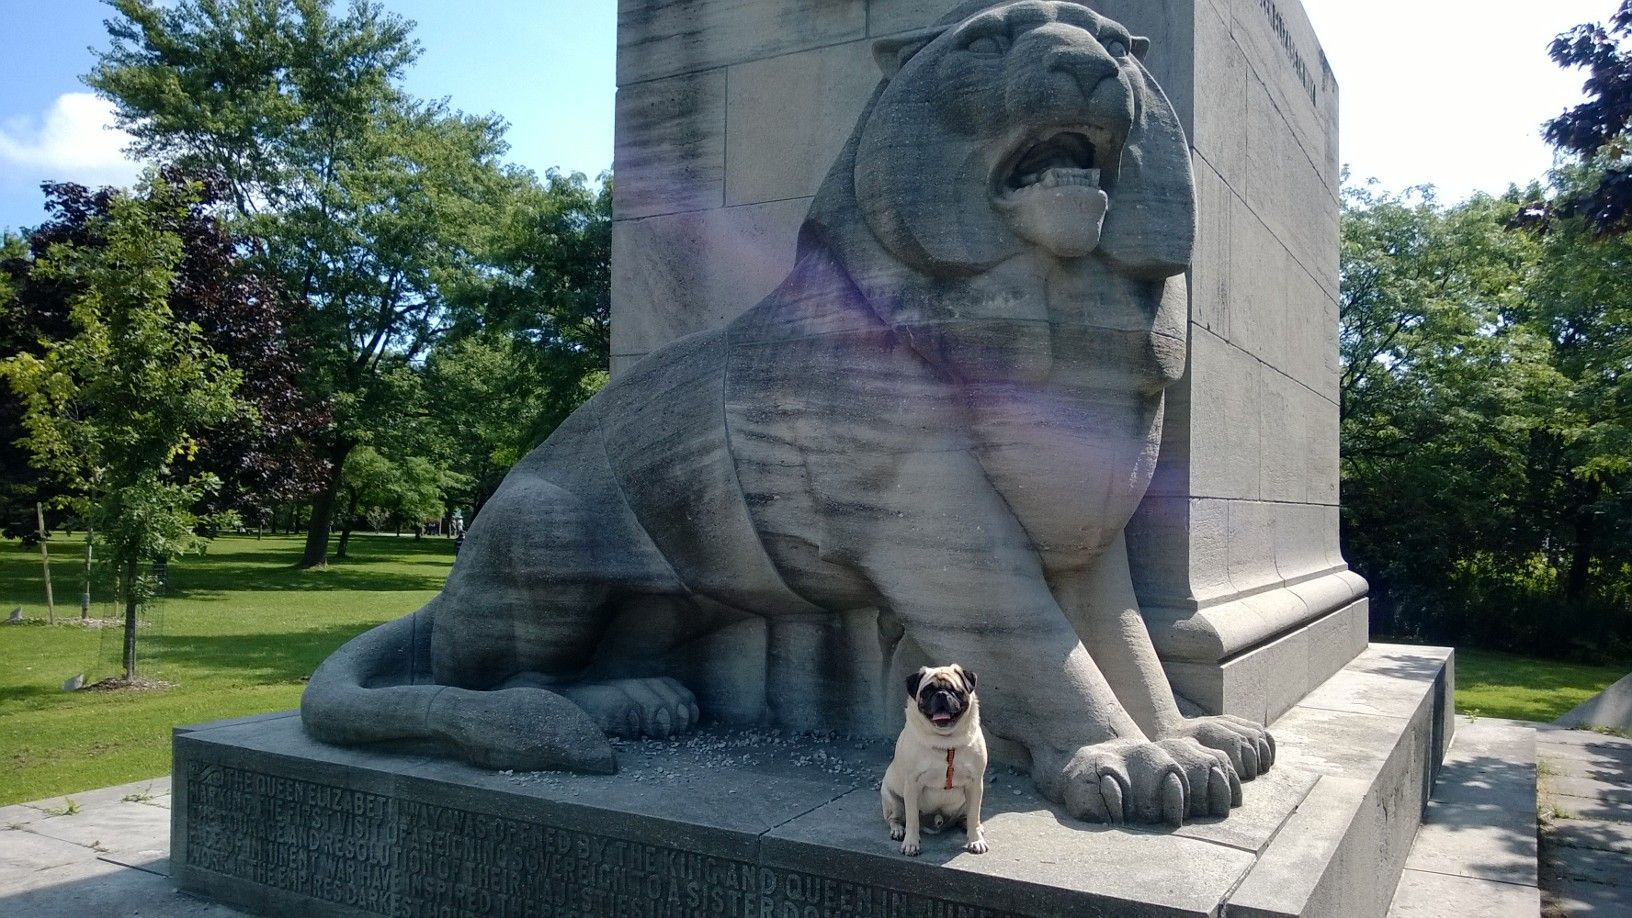 Roaar Milo Poses With The Queen Elizabeth Way Monument Lion